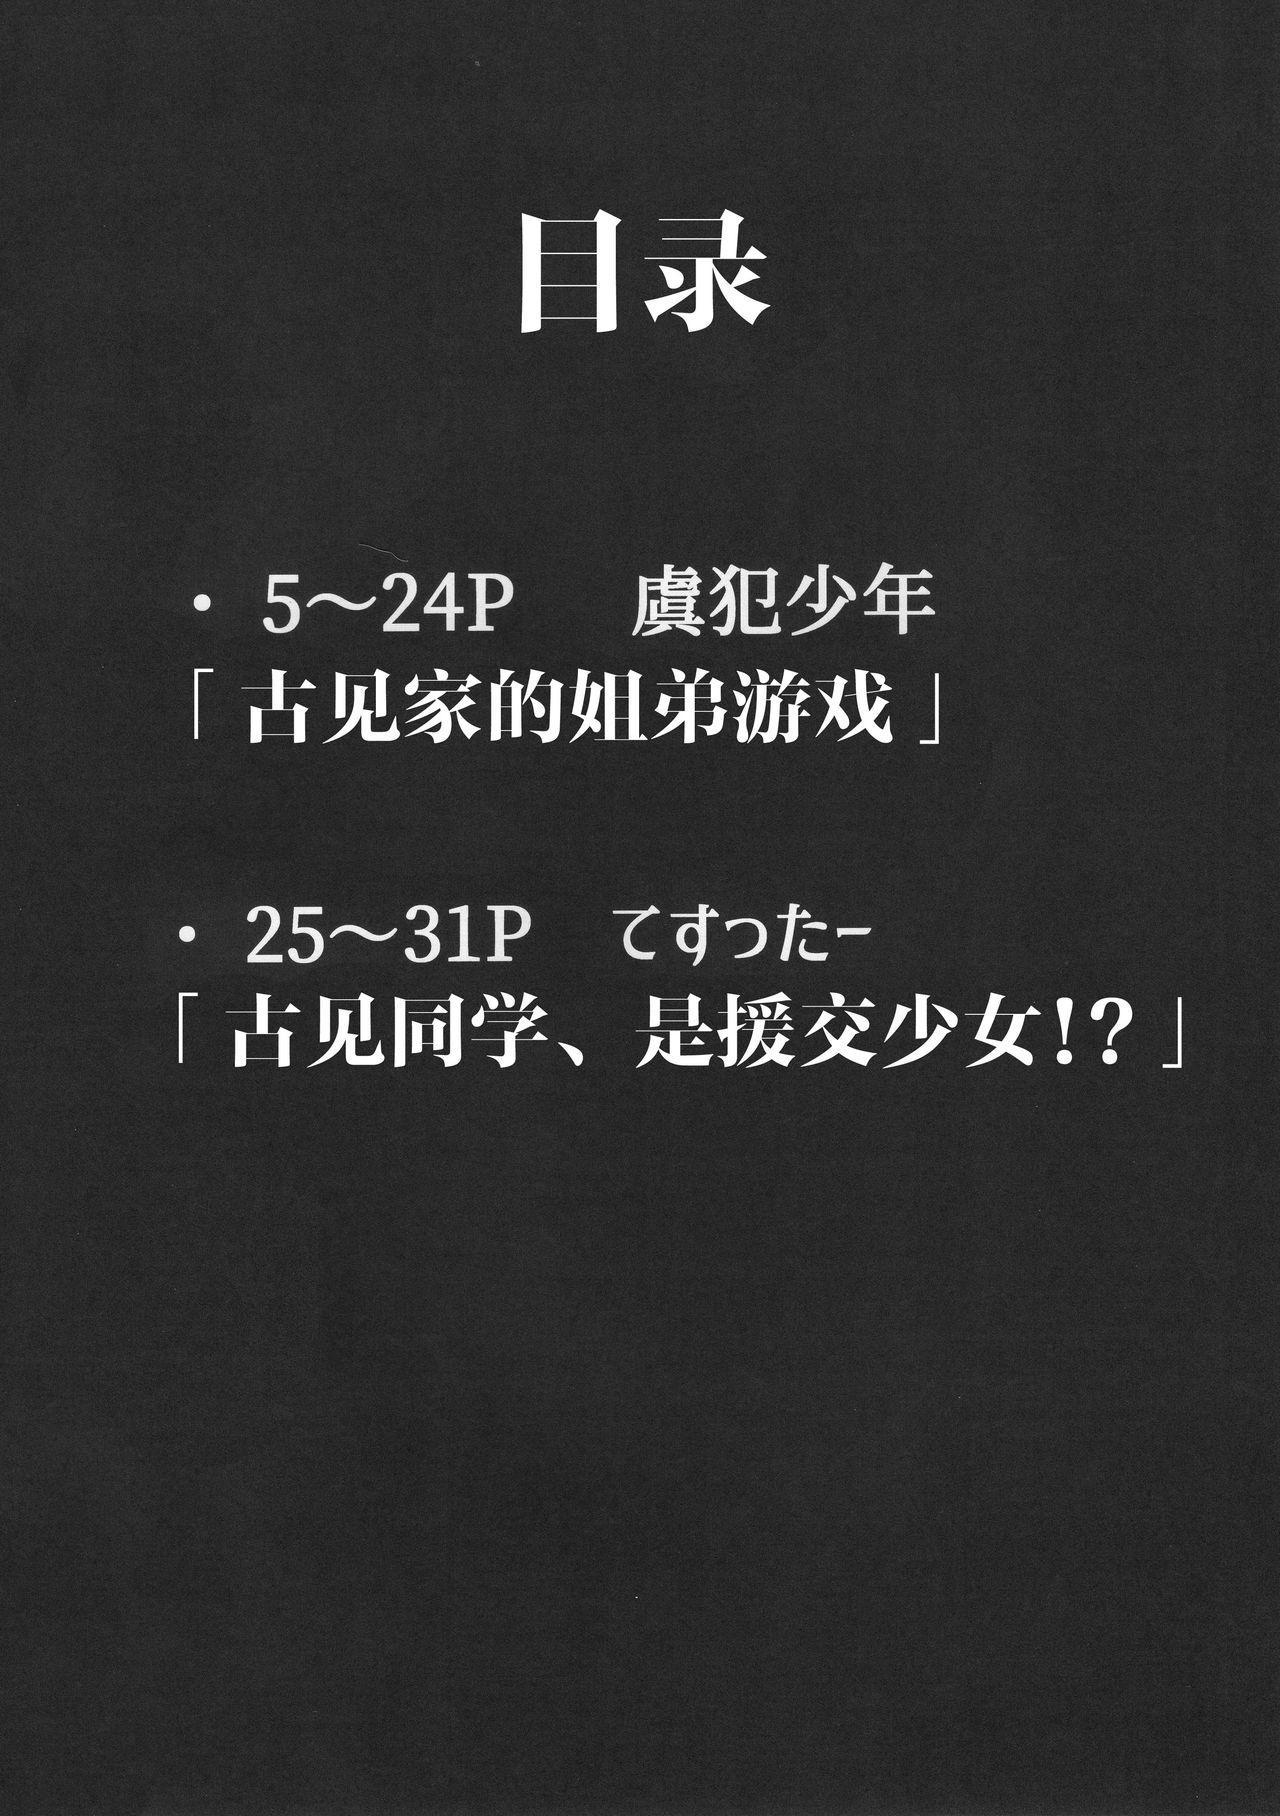 Komi-ke no Kyoudai Asobi 3